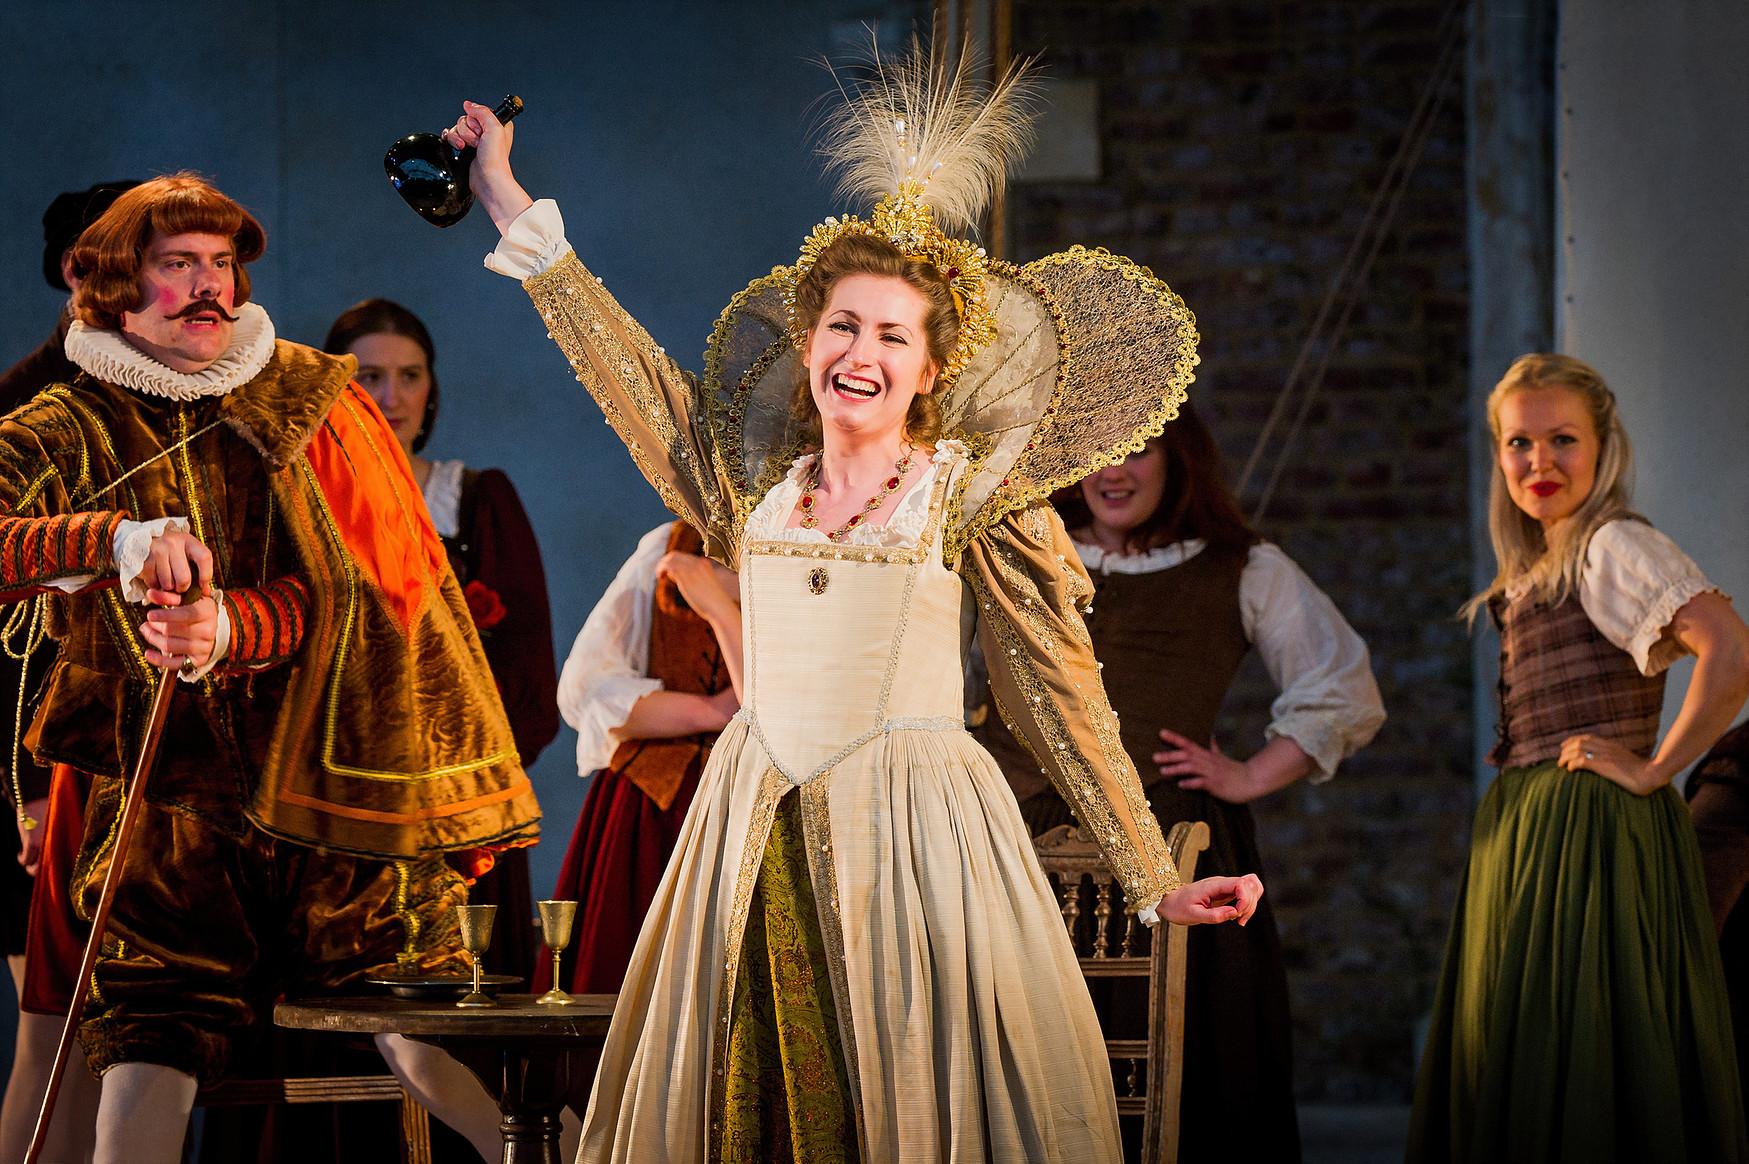 Elizabeth as Musetta in La bohème at Opera Holland Park © Robert Workman